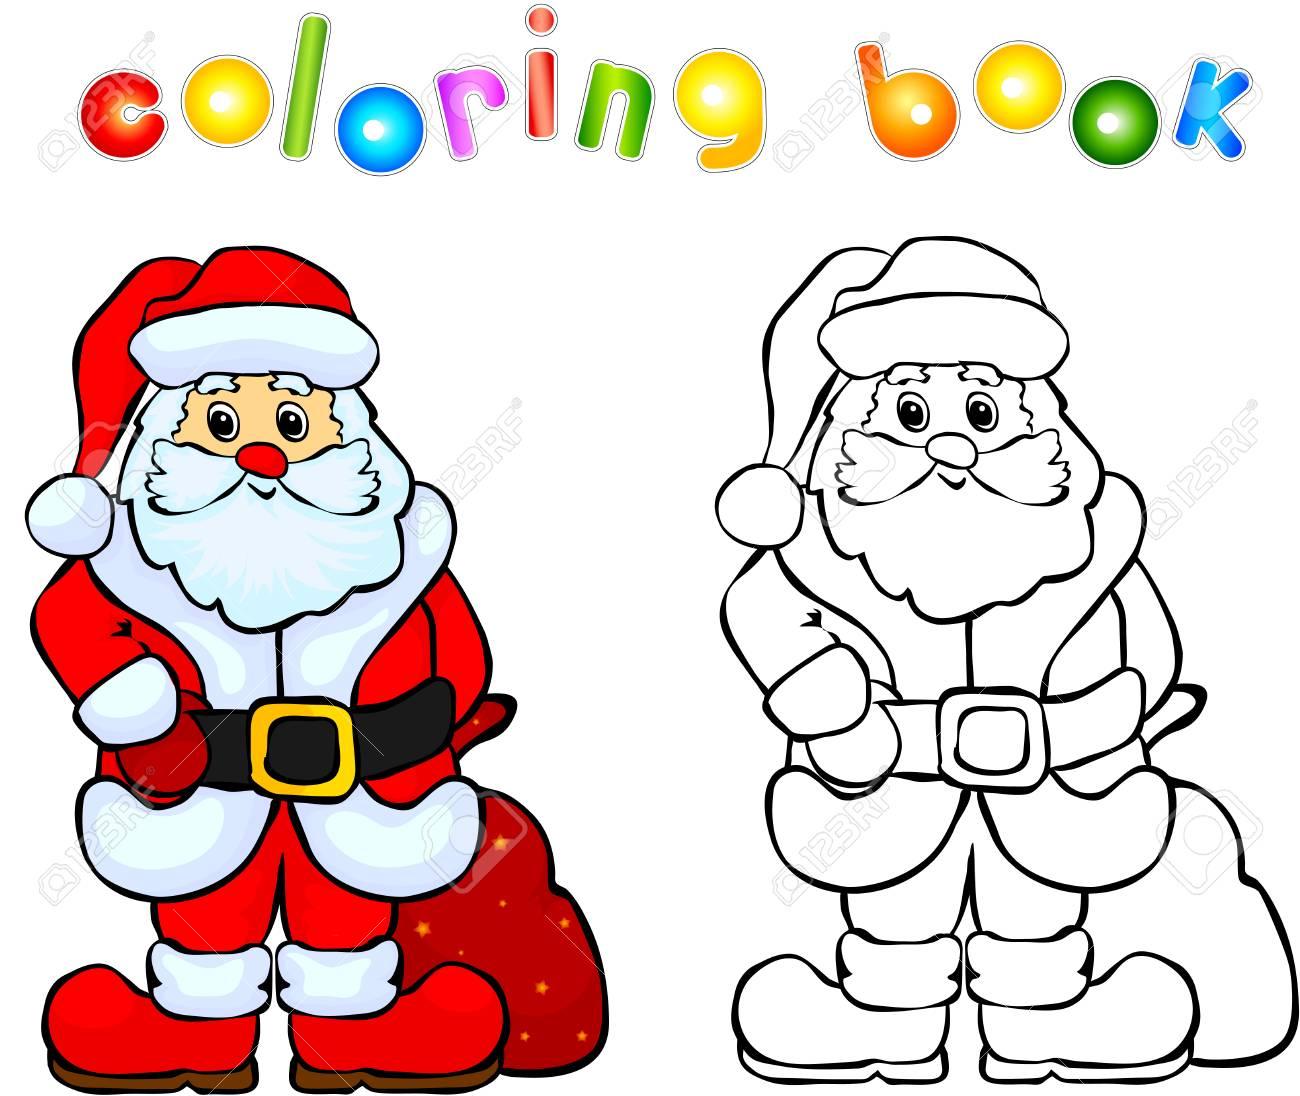 funny smiling santa claus coloring book illustration for children stock illustration 42567867 - Santa Claus Coloring Book